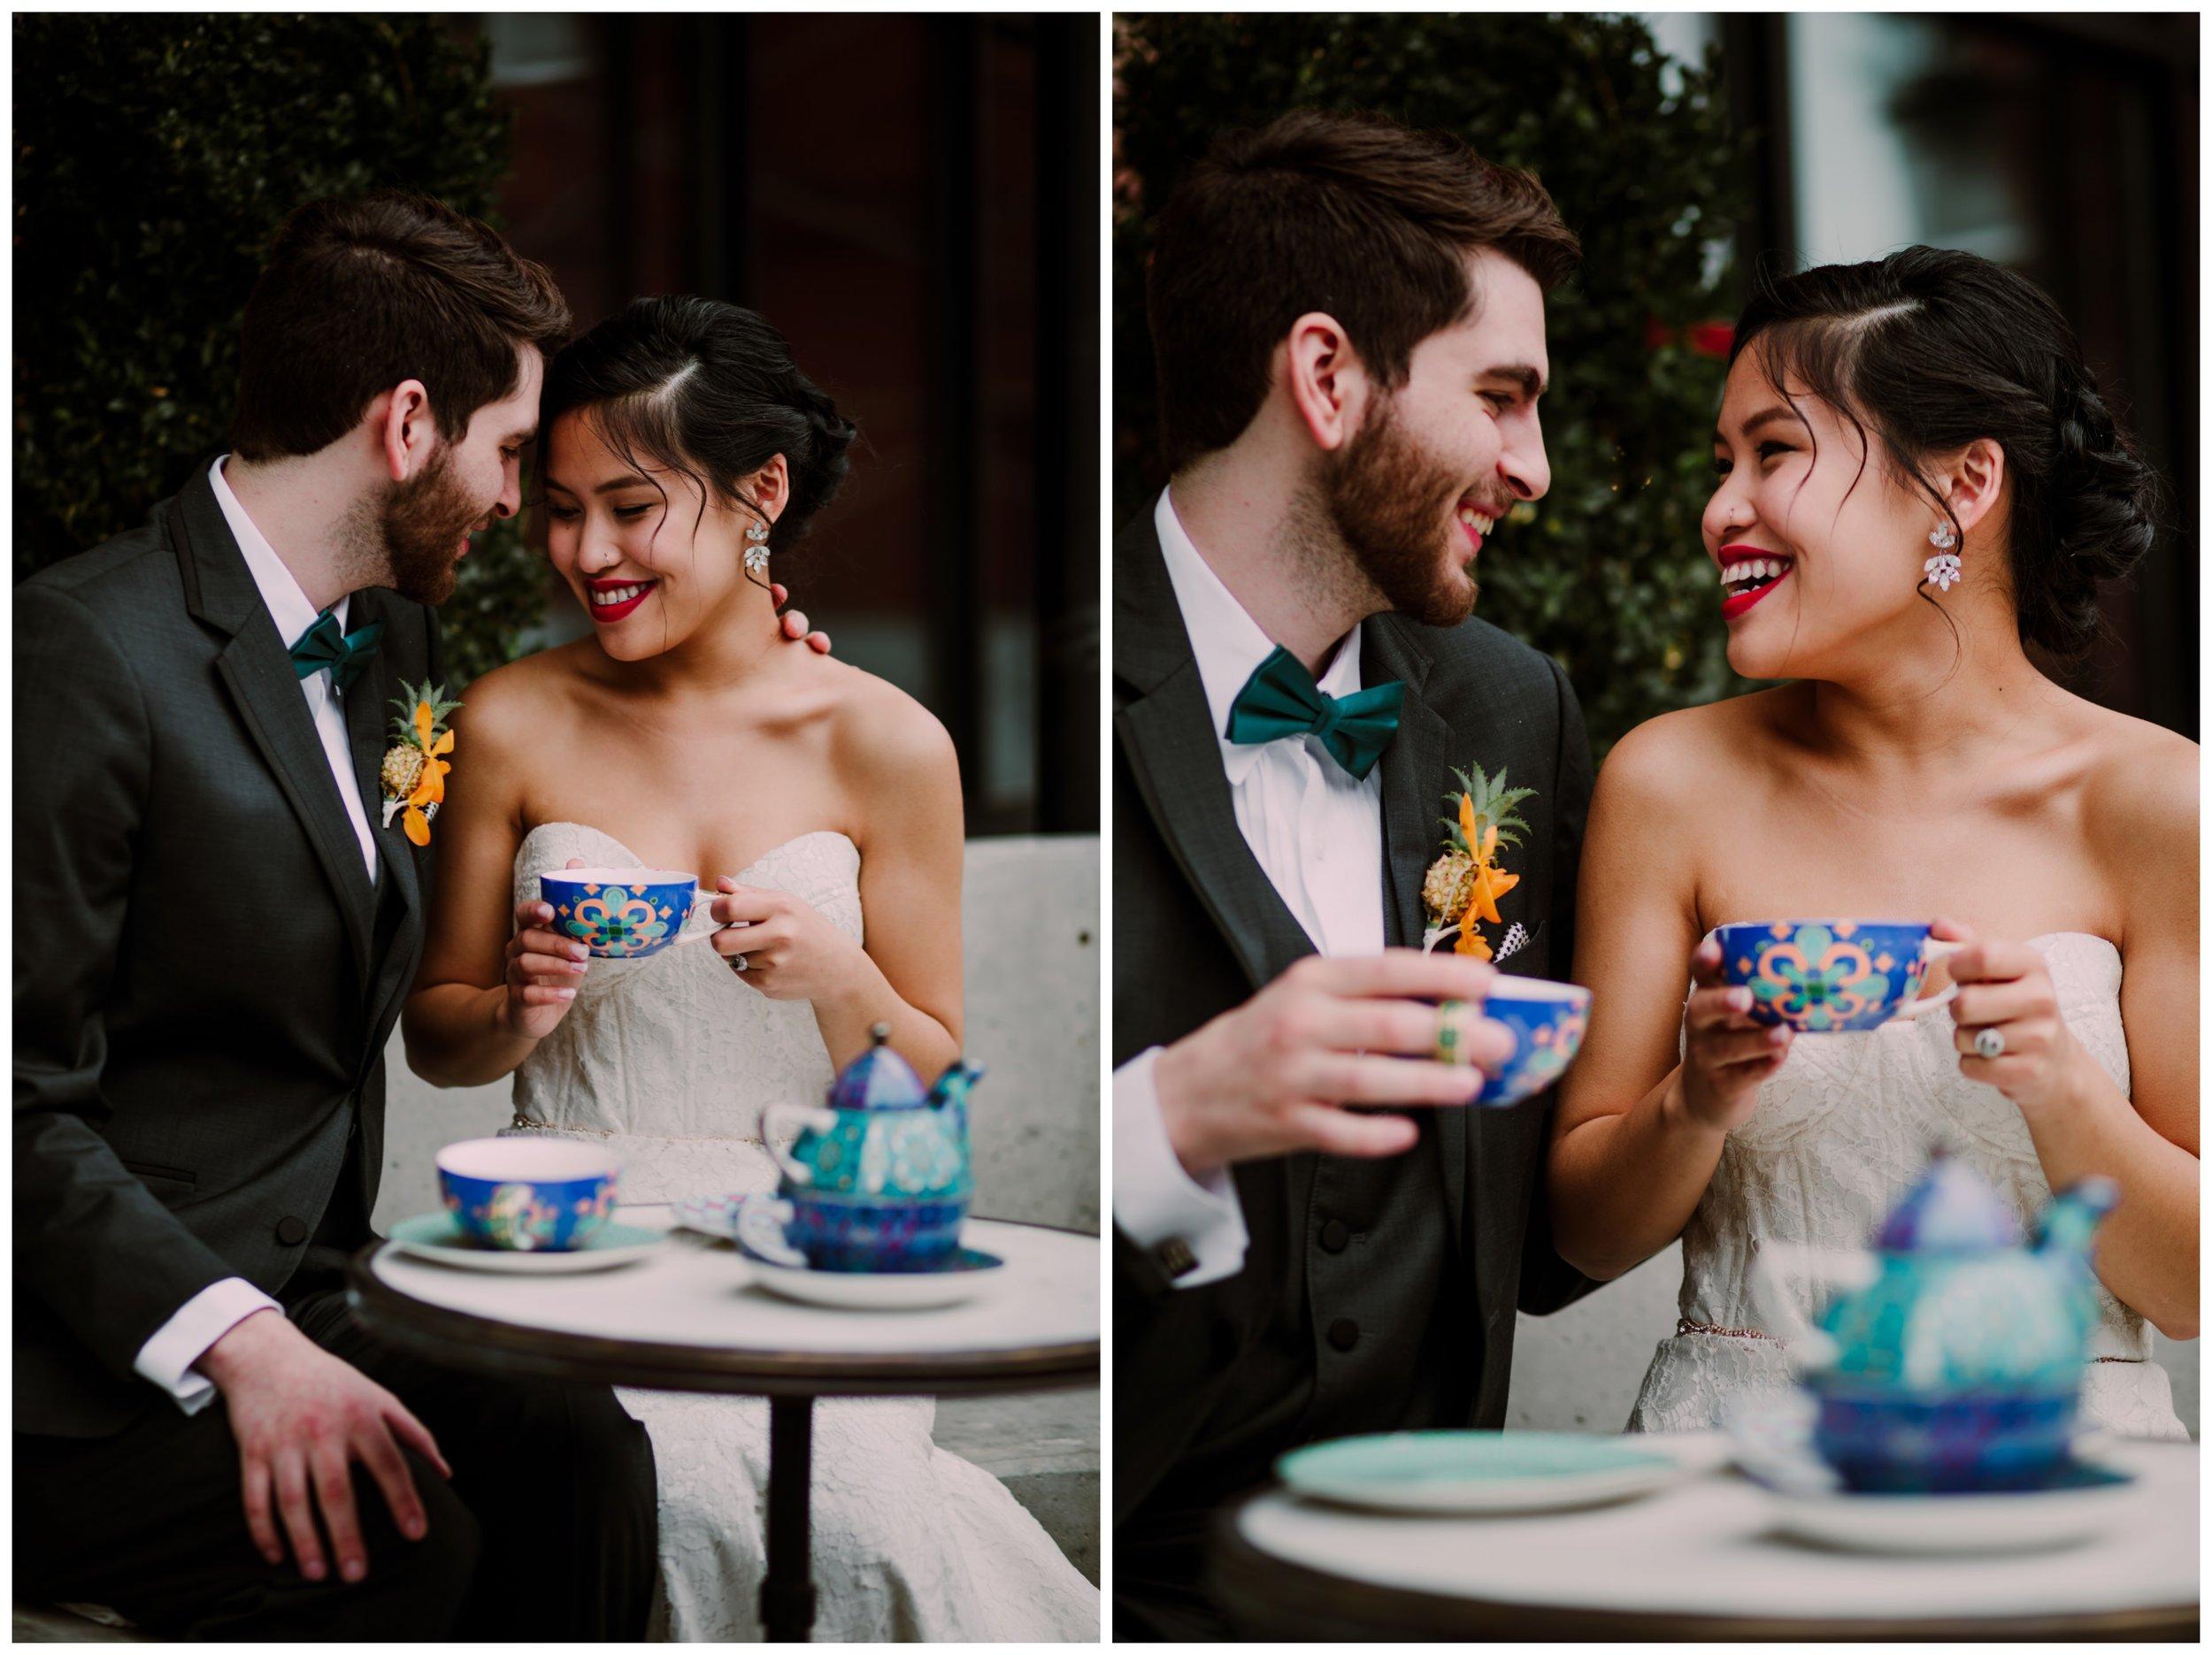 Williamsburg Hotel Wedding Feature on Catalyst Wedding Co.   Styled Shoot